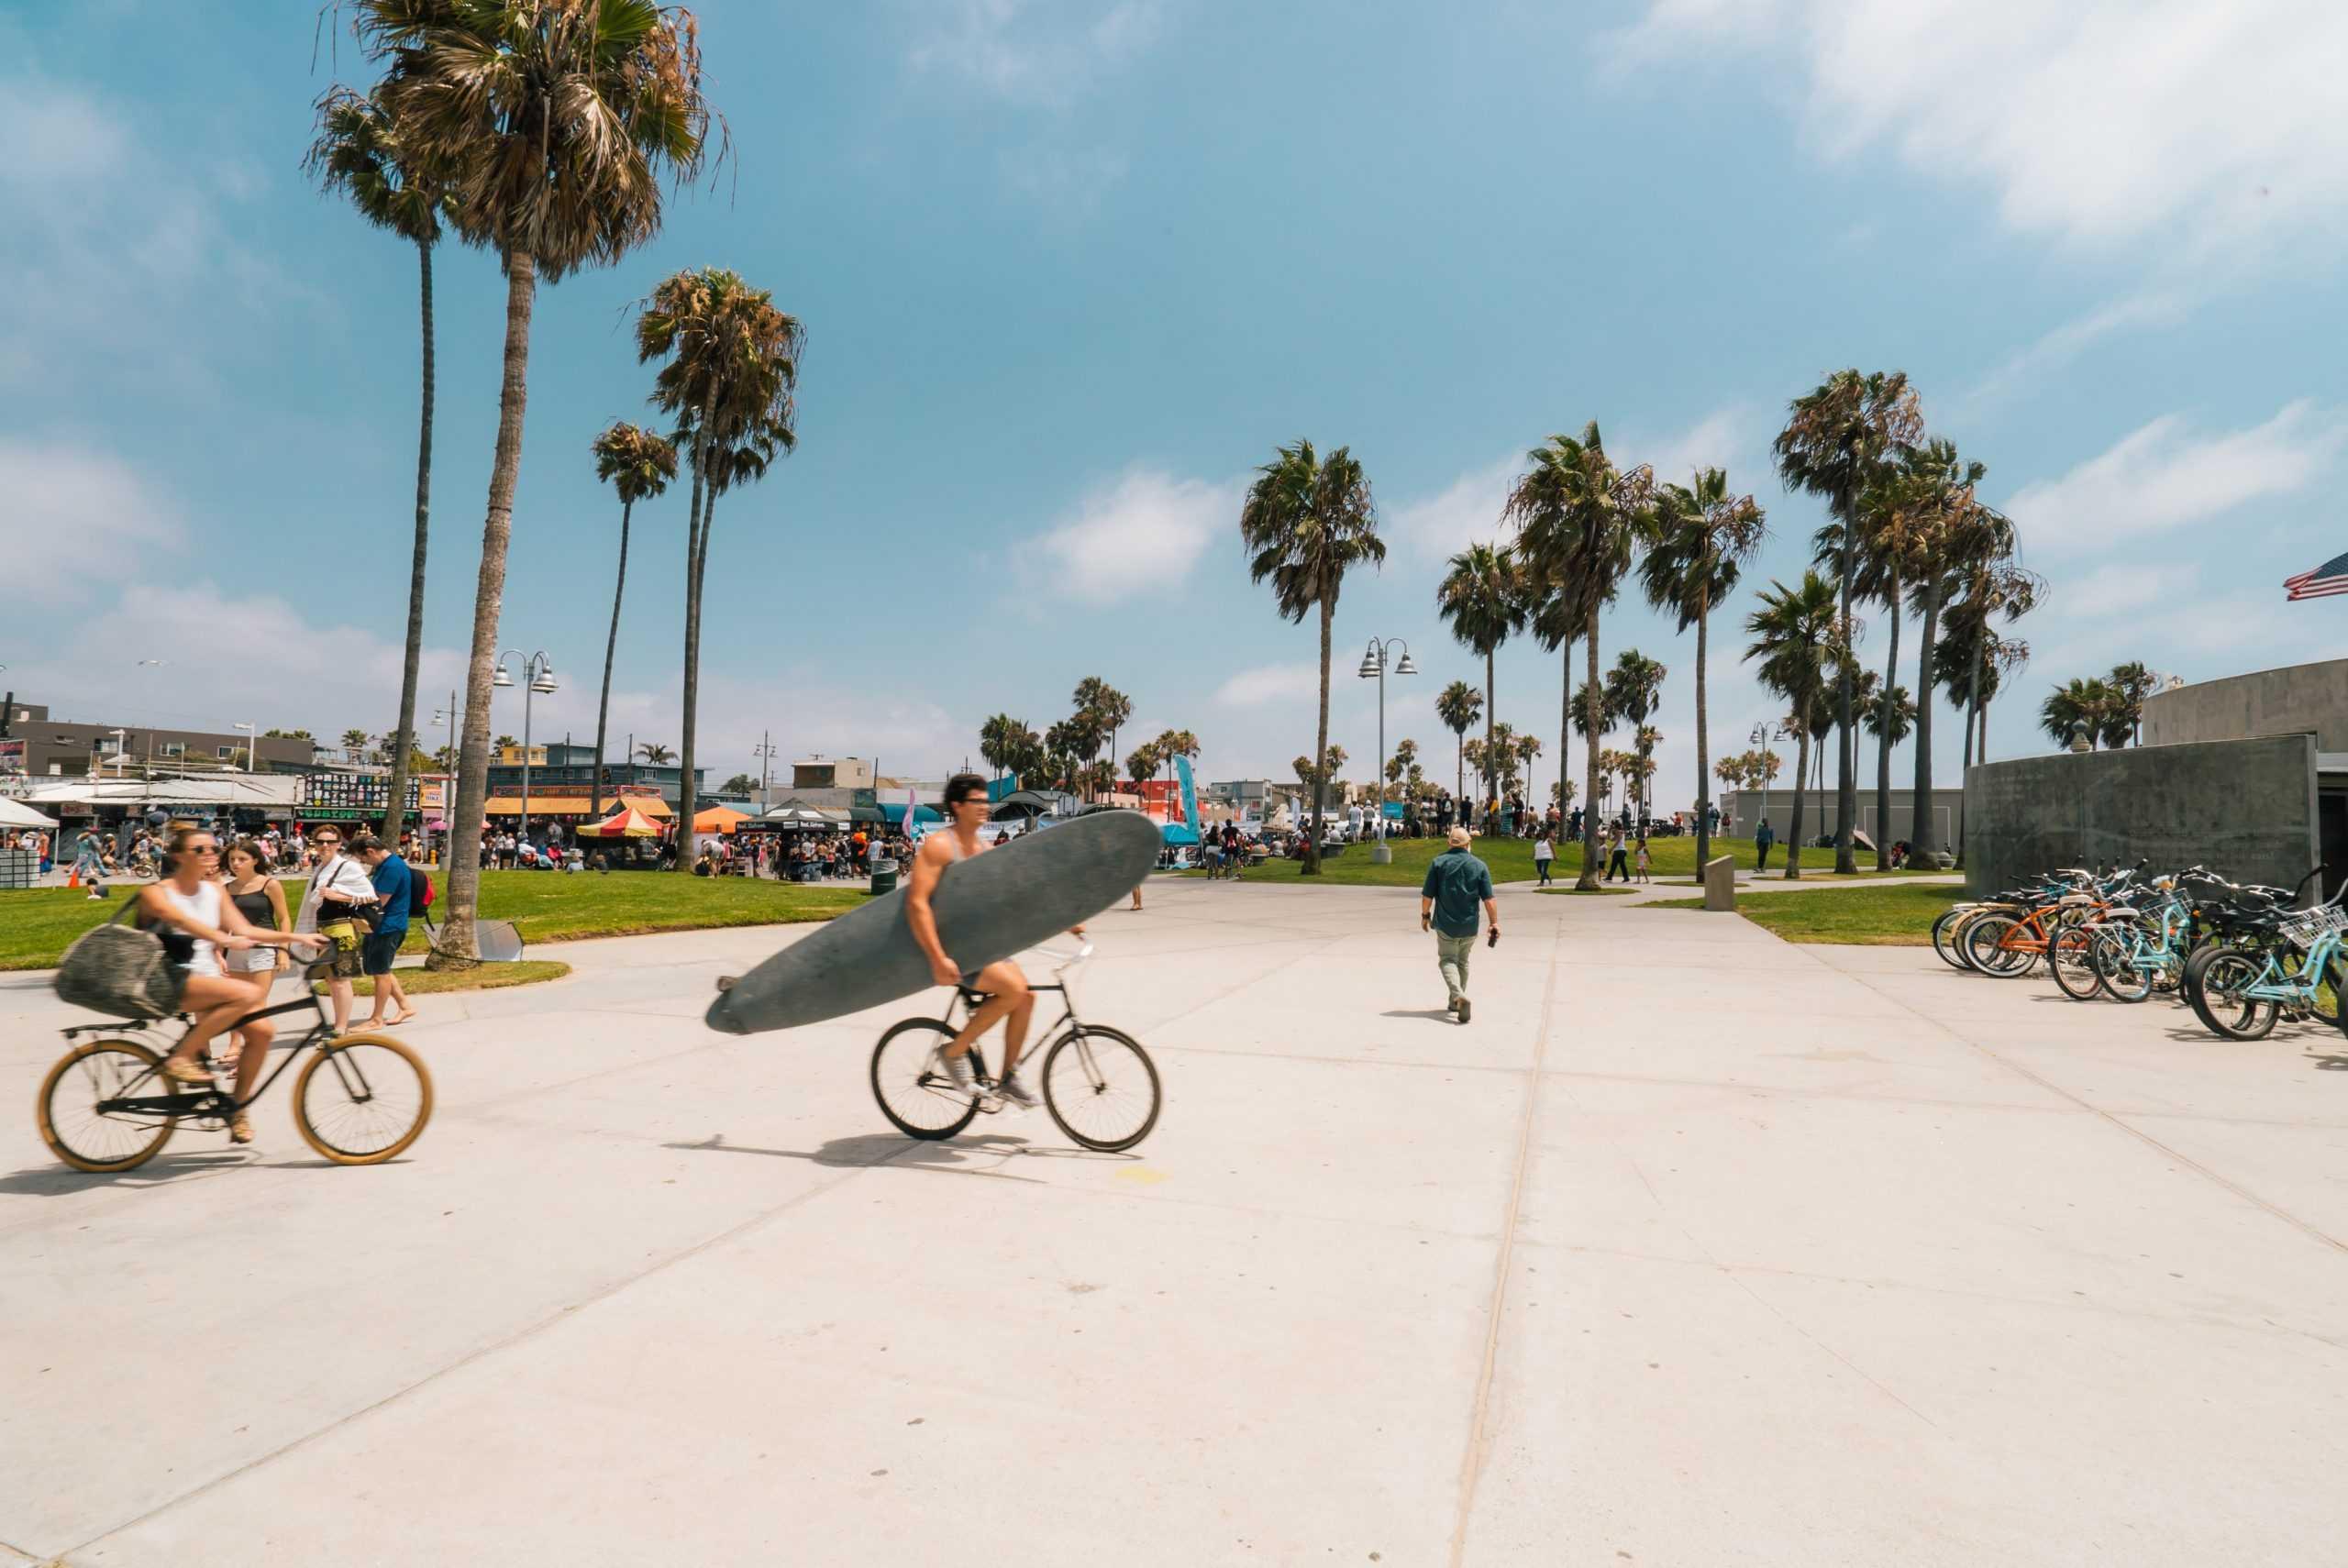 Biking with a surfboard